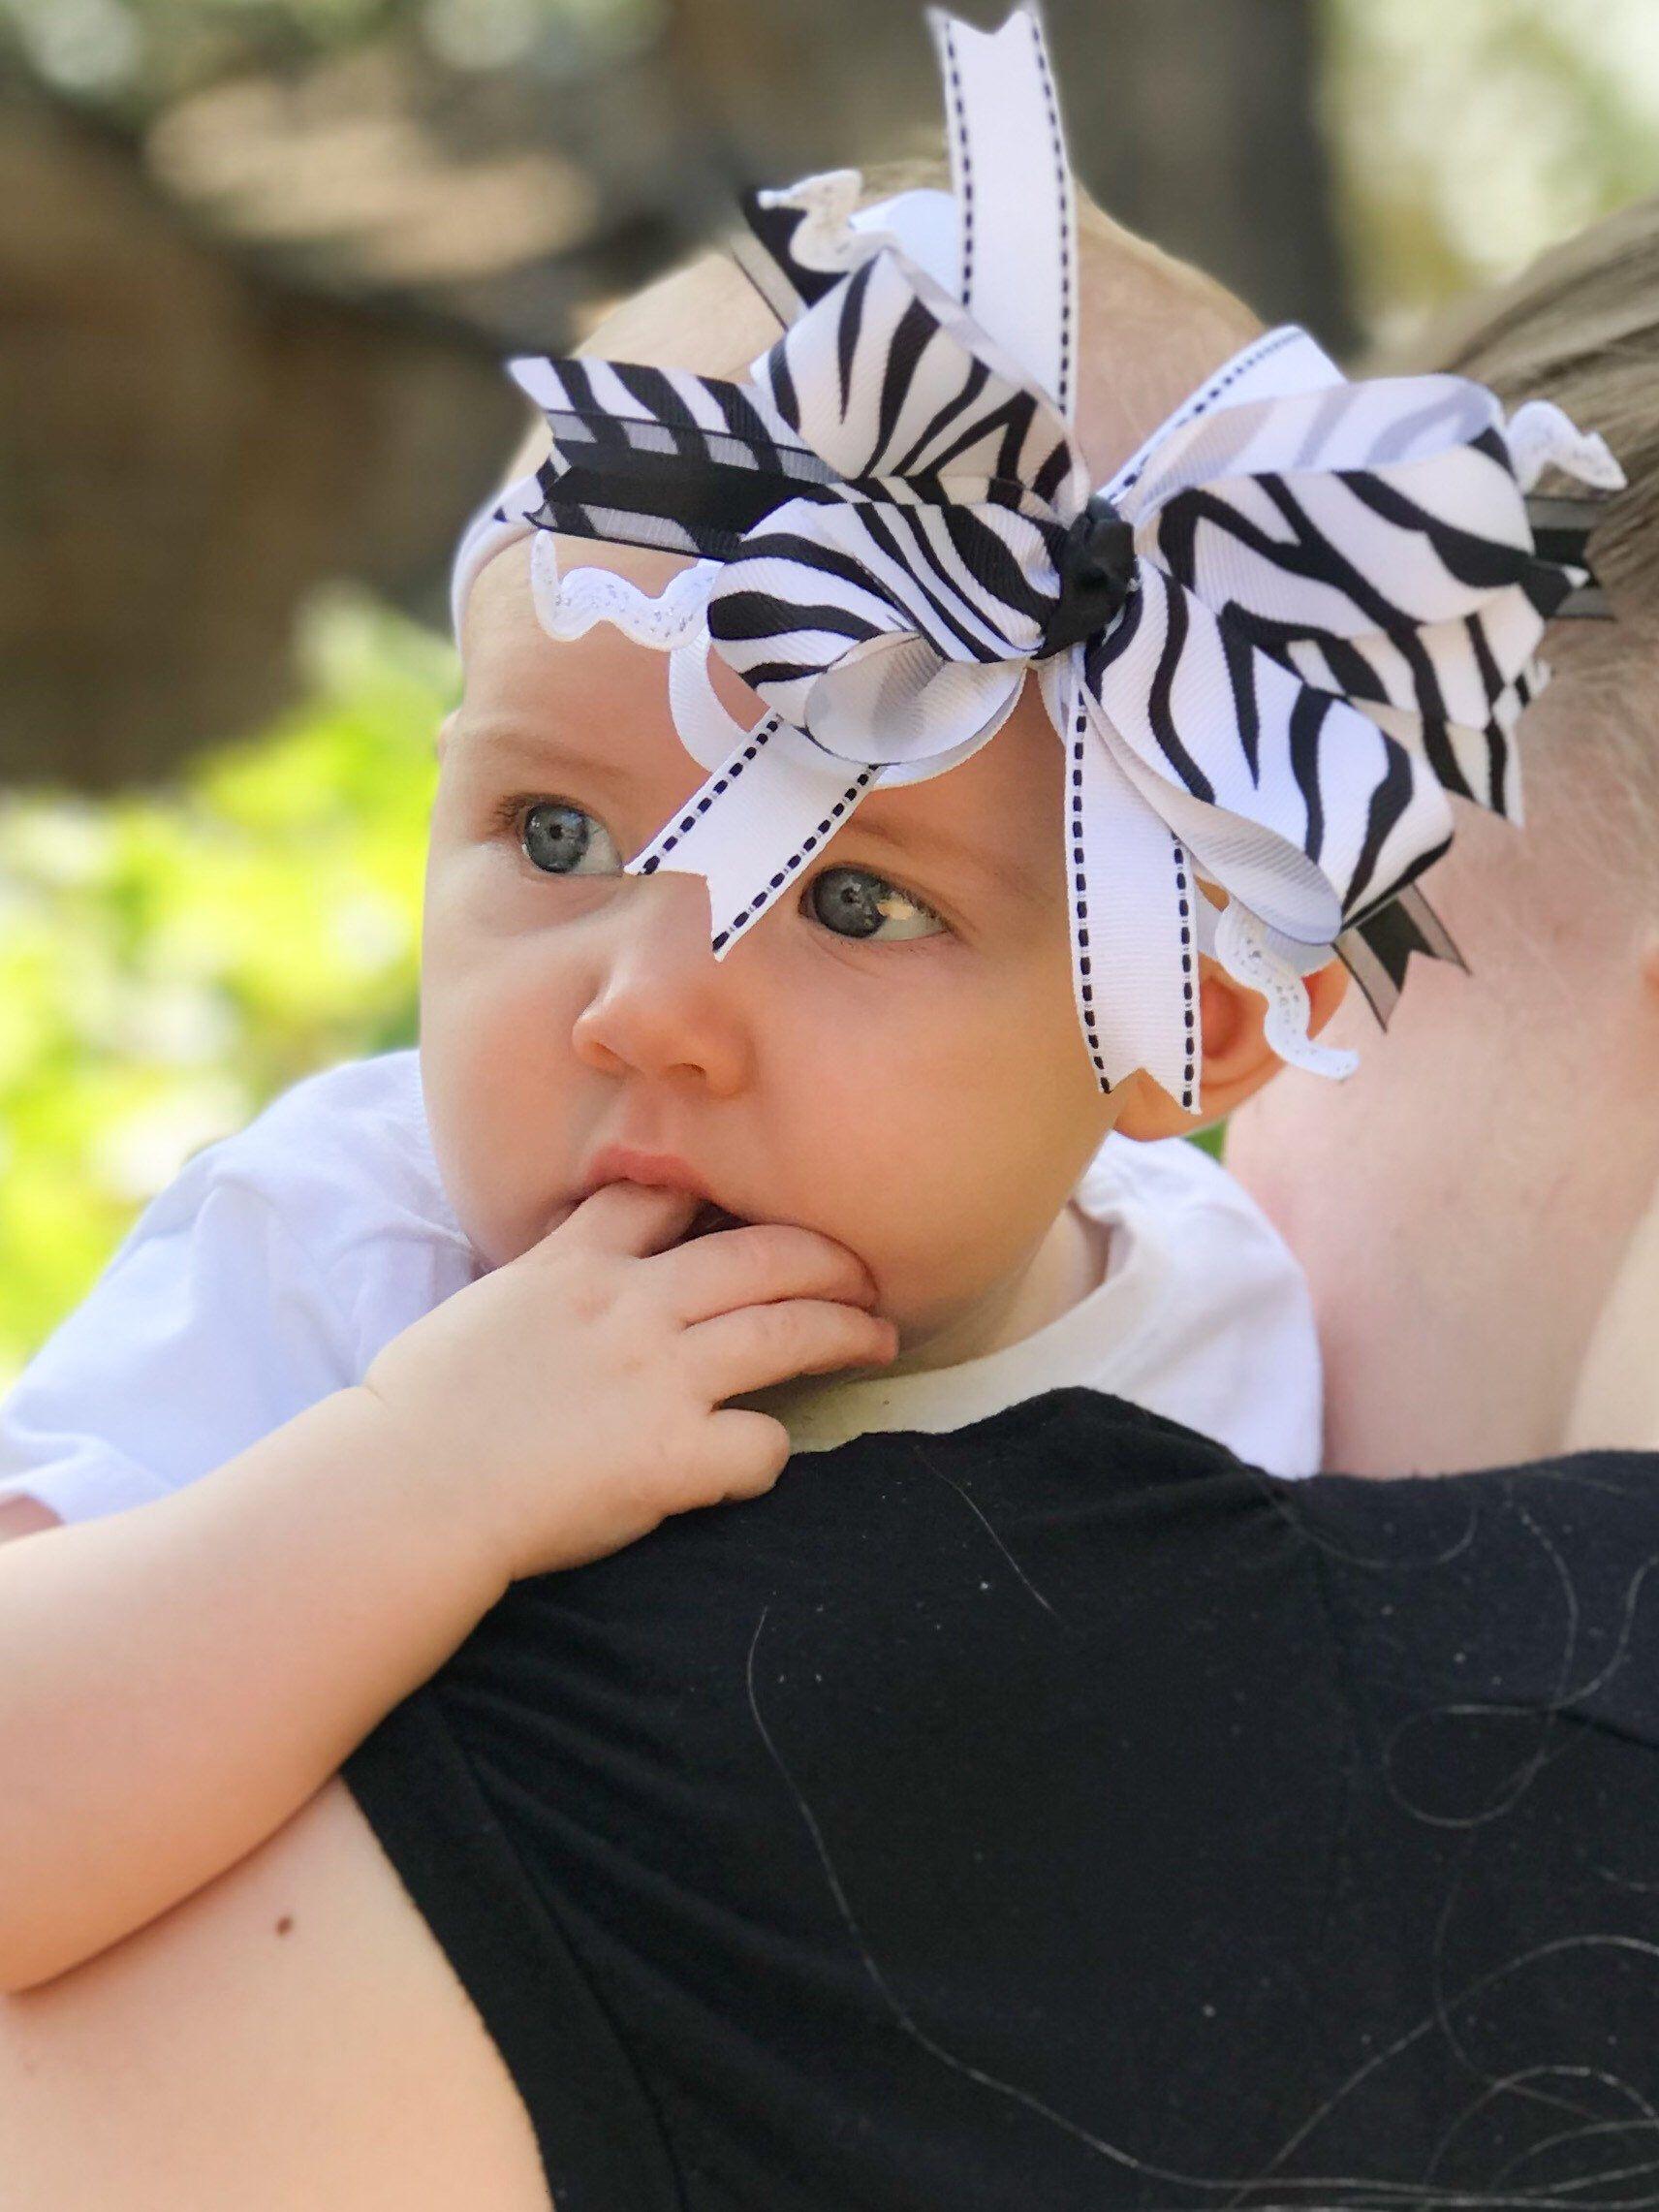 Ivory Lace Headband Baby Bow Headband Fabric and Lace Bow Nylon Baby Headband Baby Girl Shower Gift Newborn Photo Prop Toddler Bows